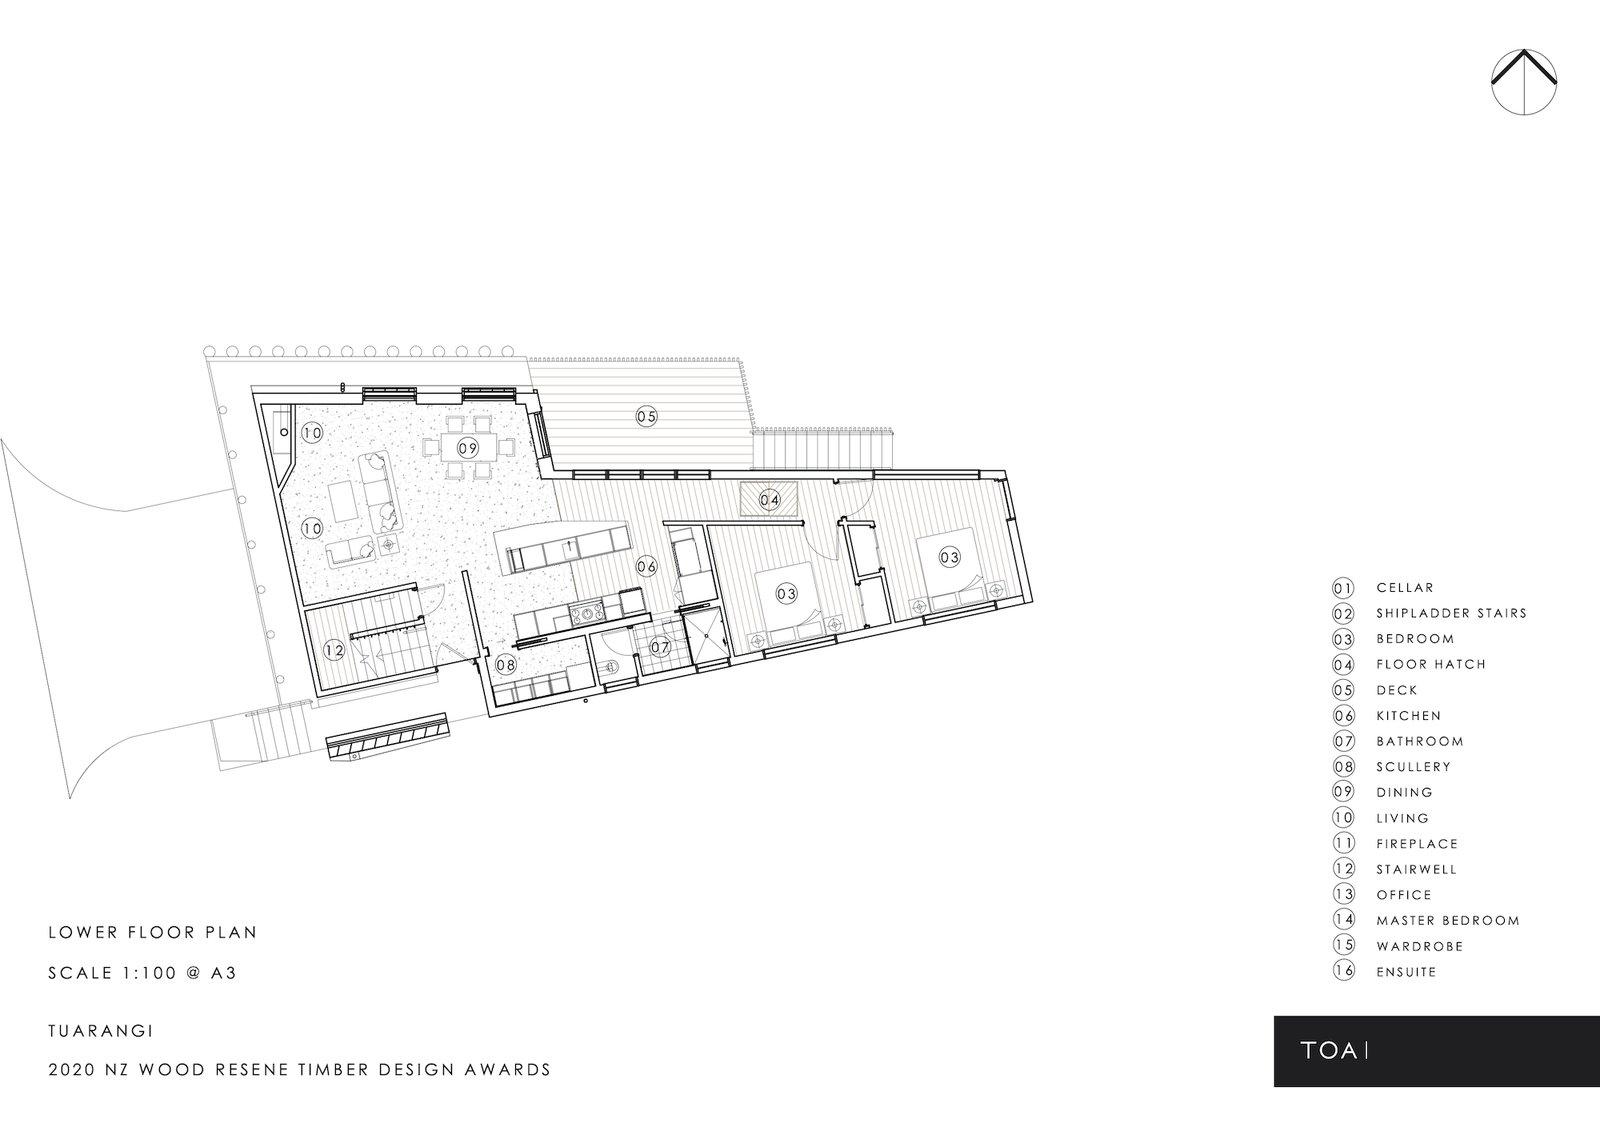 Lower floor plan of Tuarangi House by TOA Architects.